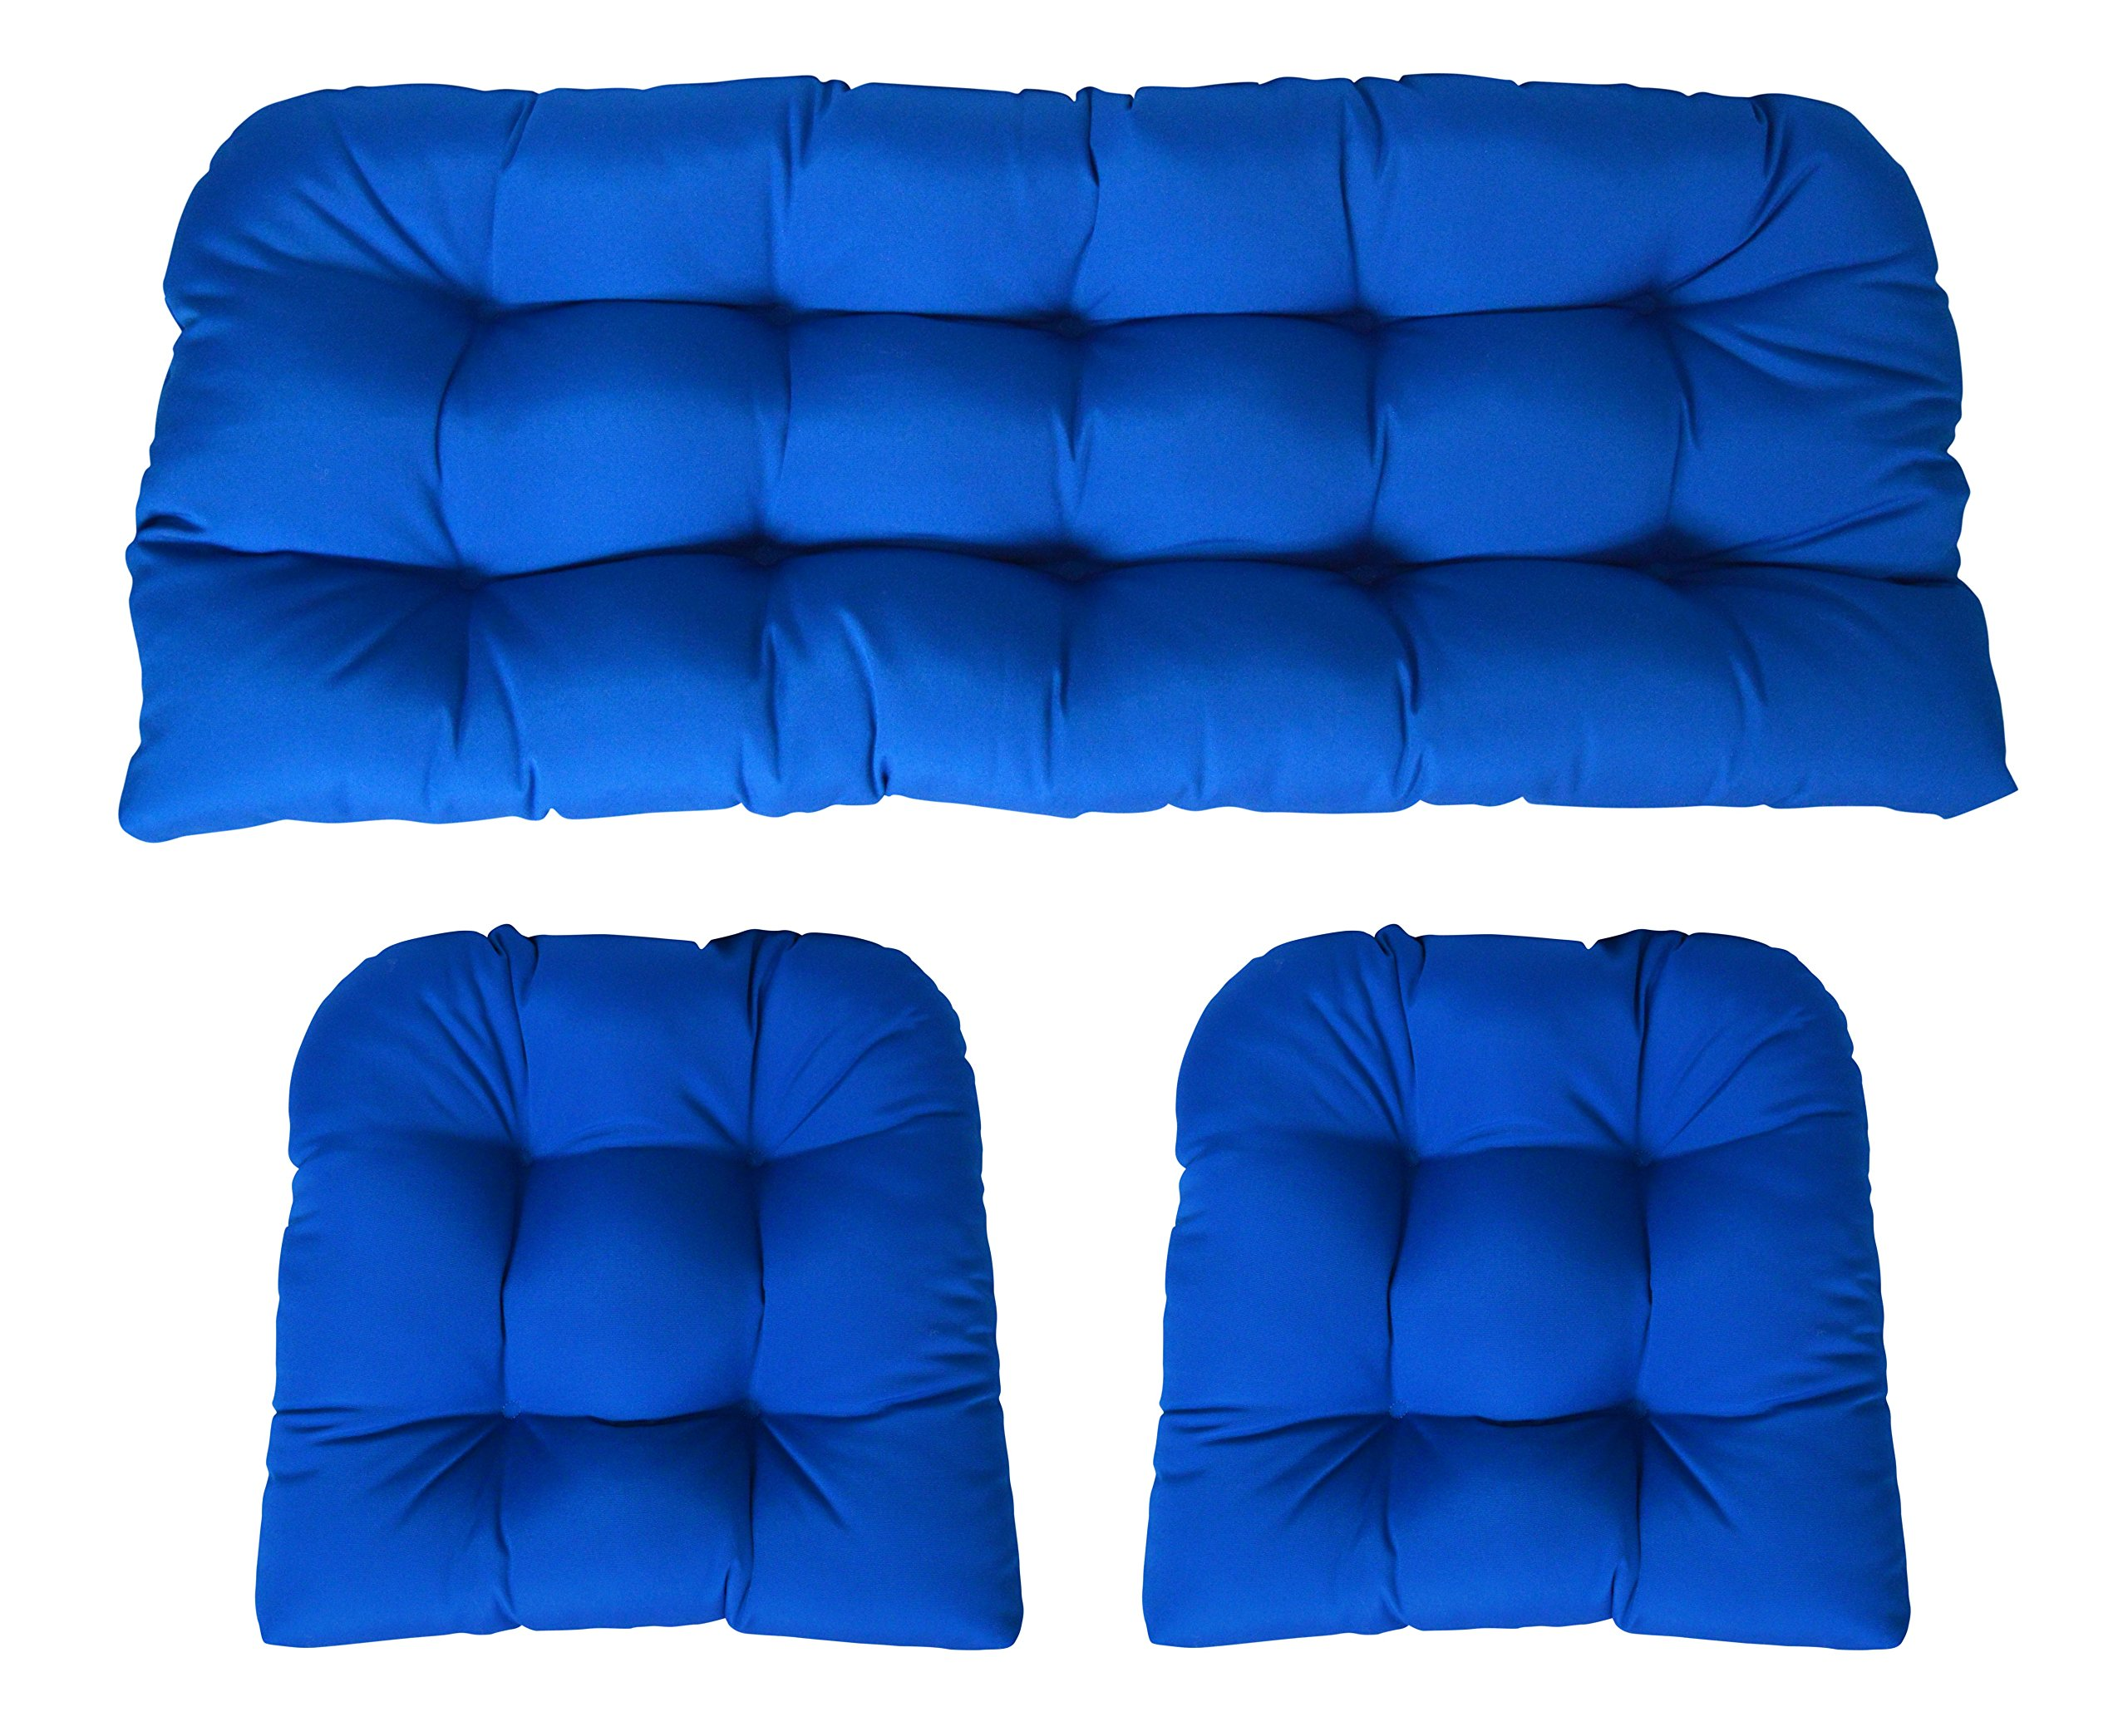 RSH Decor Sunbrella Canvas Pacific Blue 3 Piece Wicker Cushion Set - Indoor/Outdoor Wicker Loveseat Settee & 2 Matching Chair Cushions